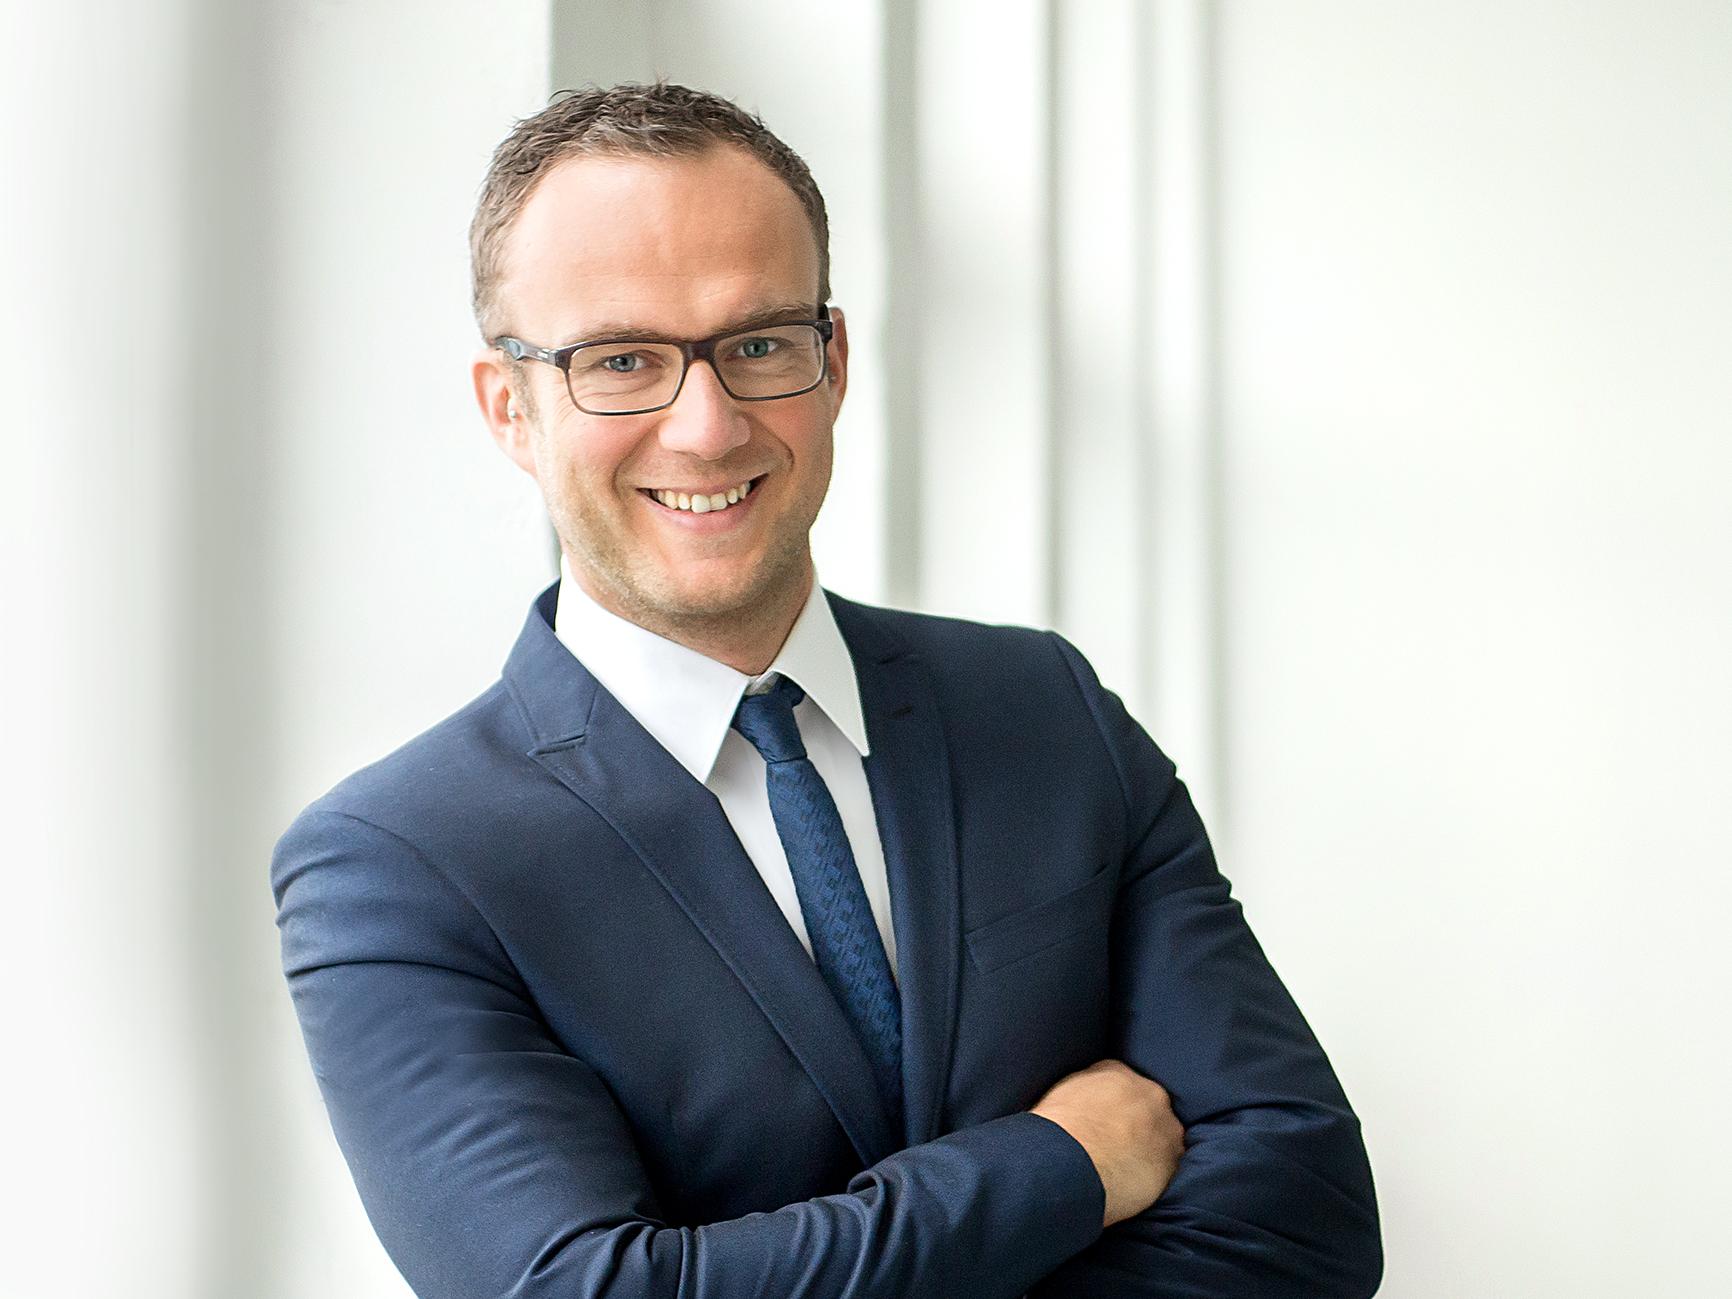 https://www.vdskc.de/wp-content/uploads/2021/03/Vormark-Kochkultur_Roy-Hartung.jpg